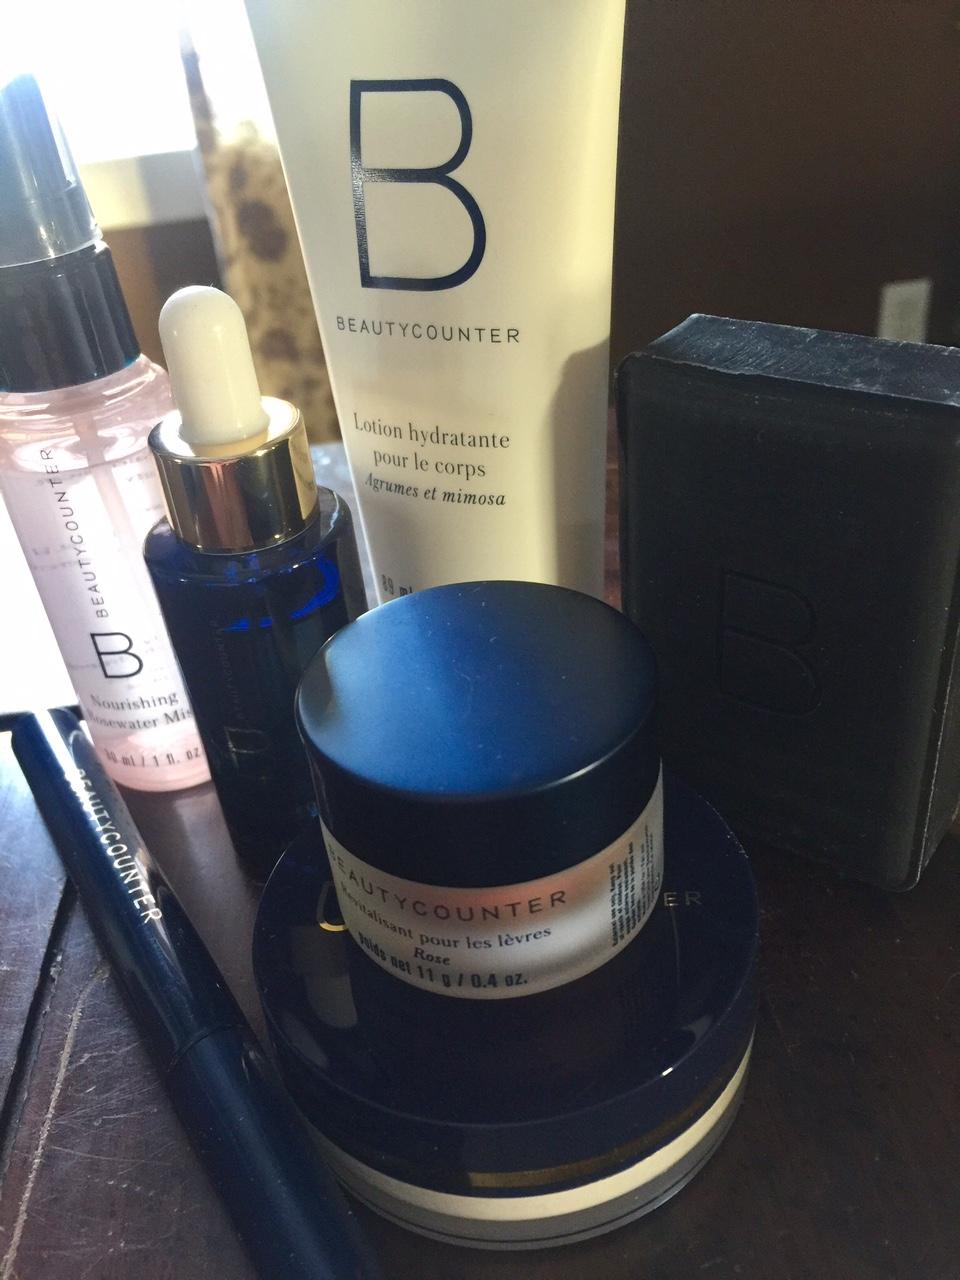 Beautycounter safe non toxic makeup and skincare